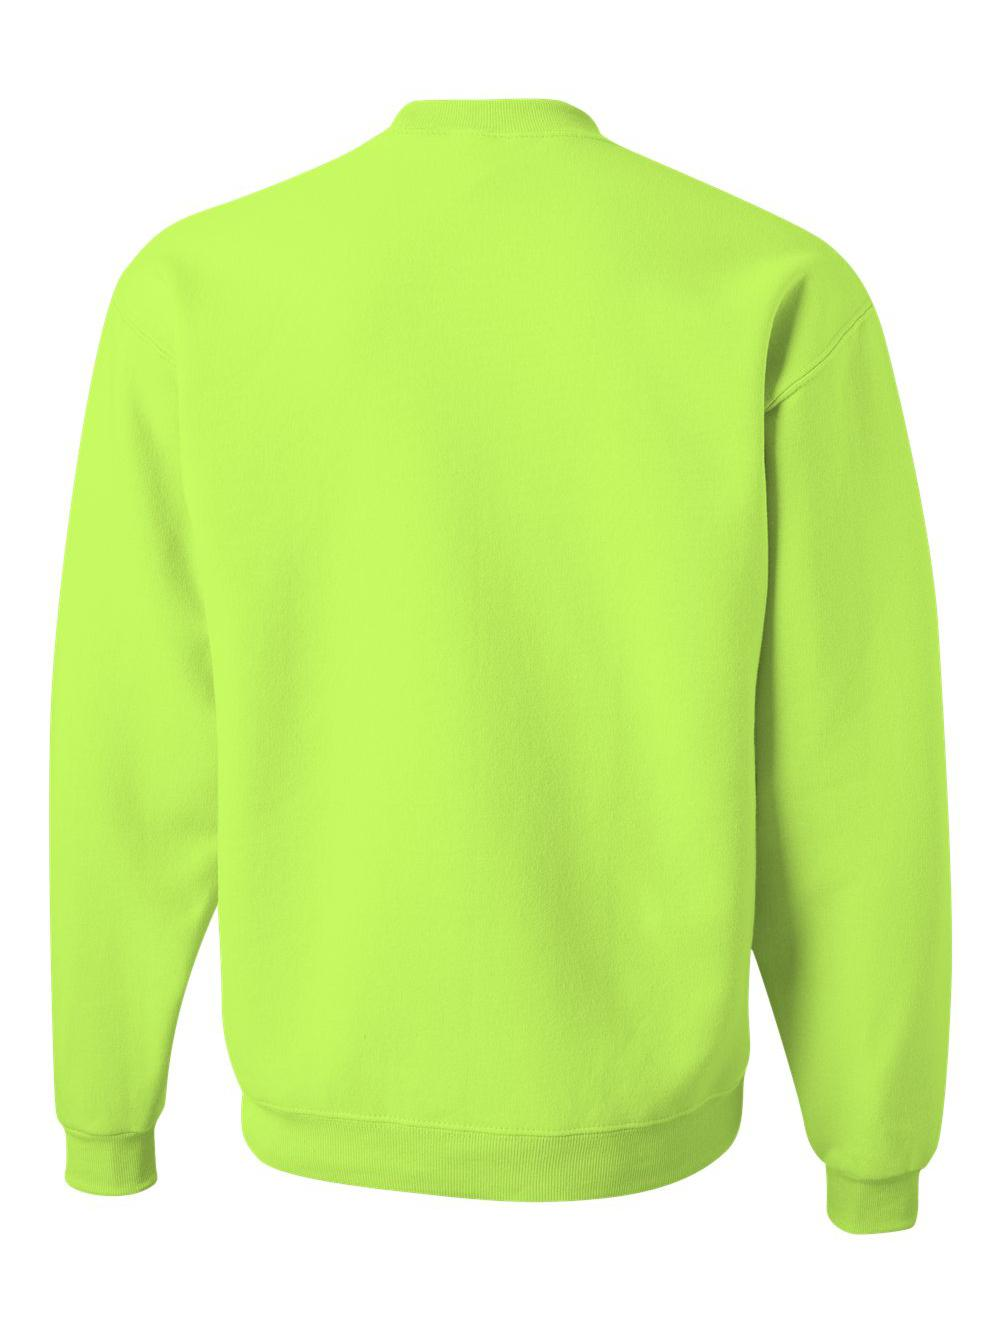 Jerzees-NuBlend-Crewneck-Sweatshirt-562MR thumbnail 76